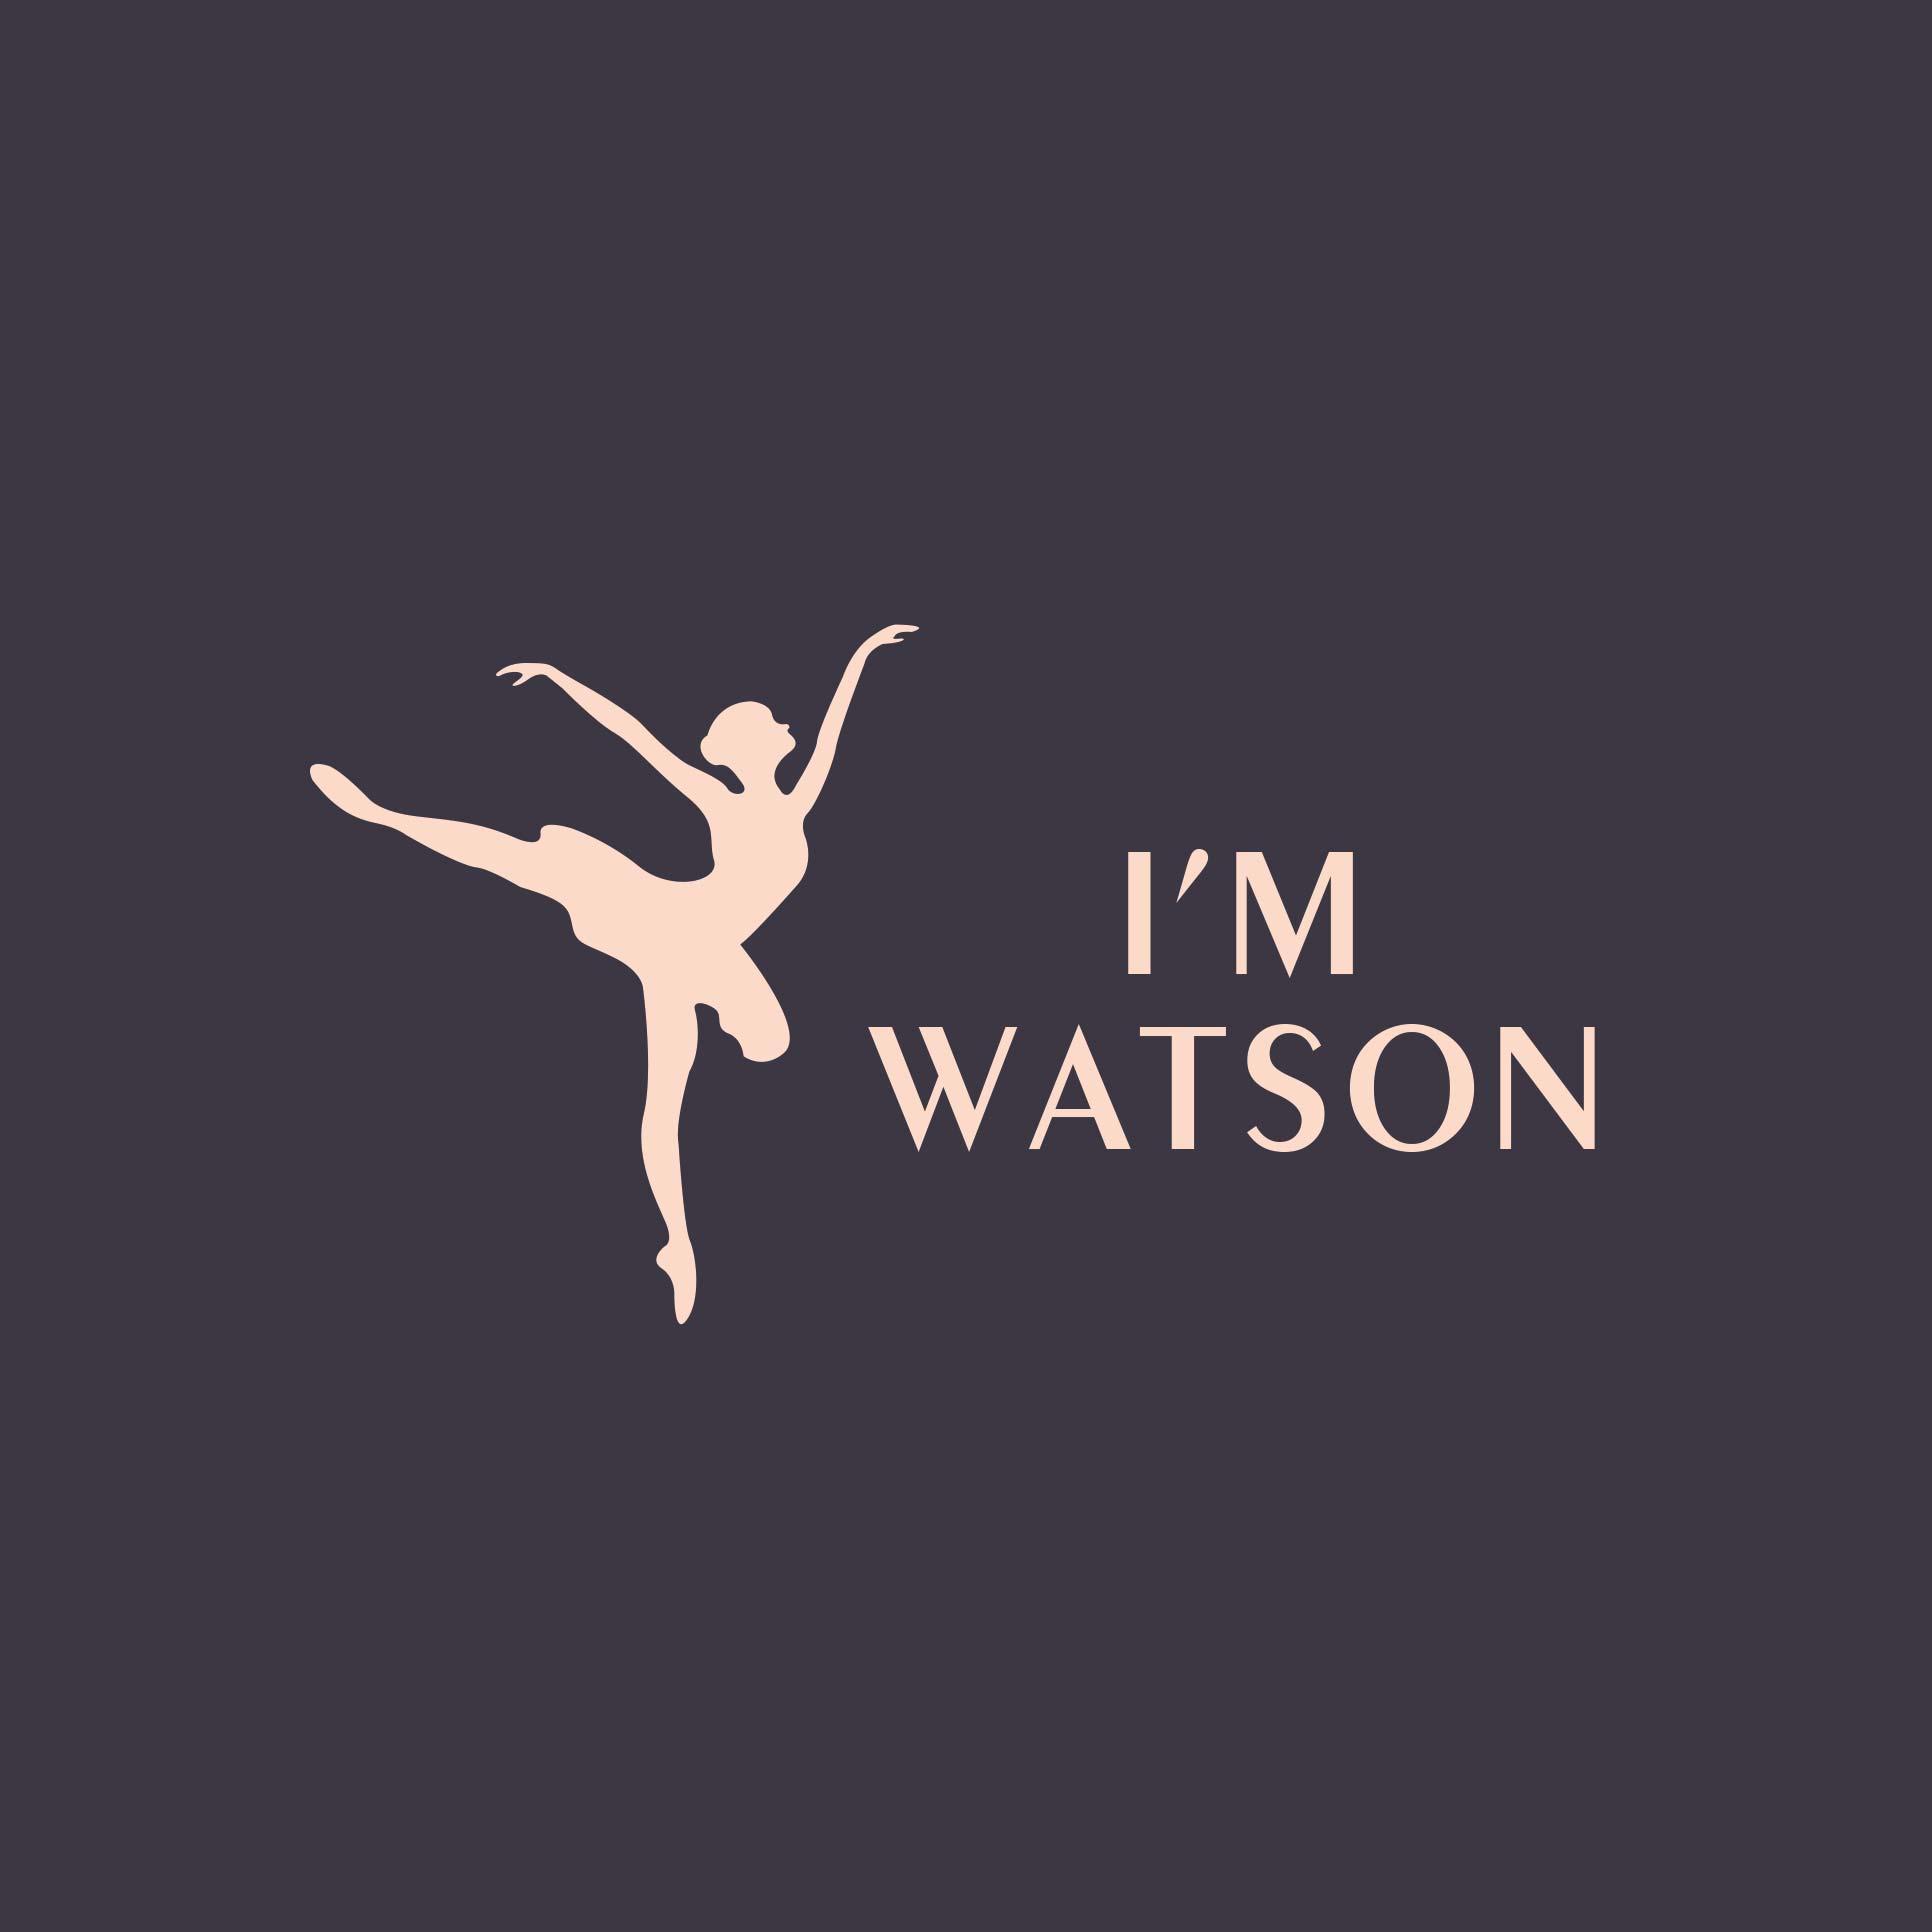 Разработать логотип для балетного бренда фото f_8205bbf16658fb11.jpg